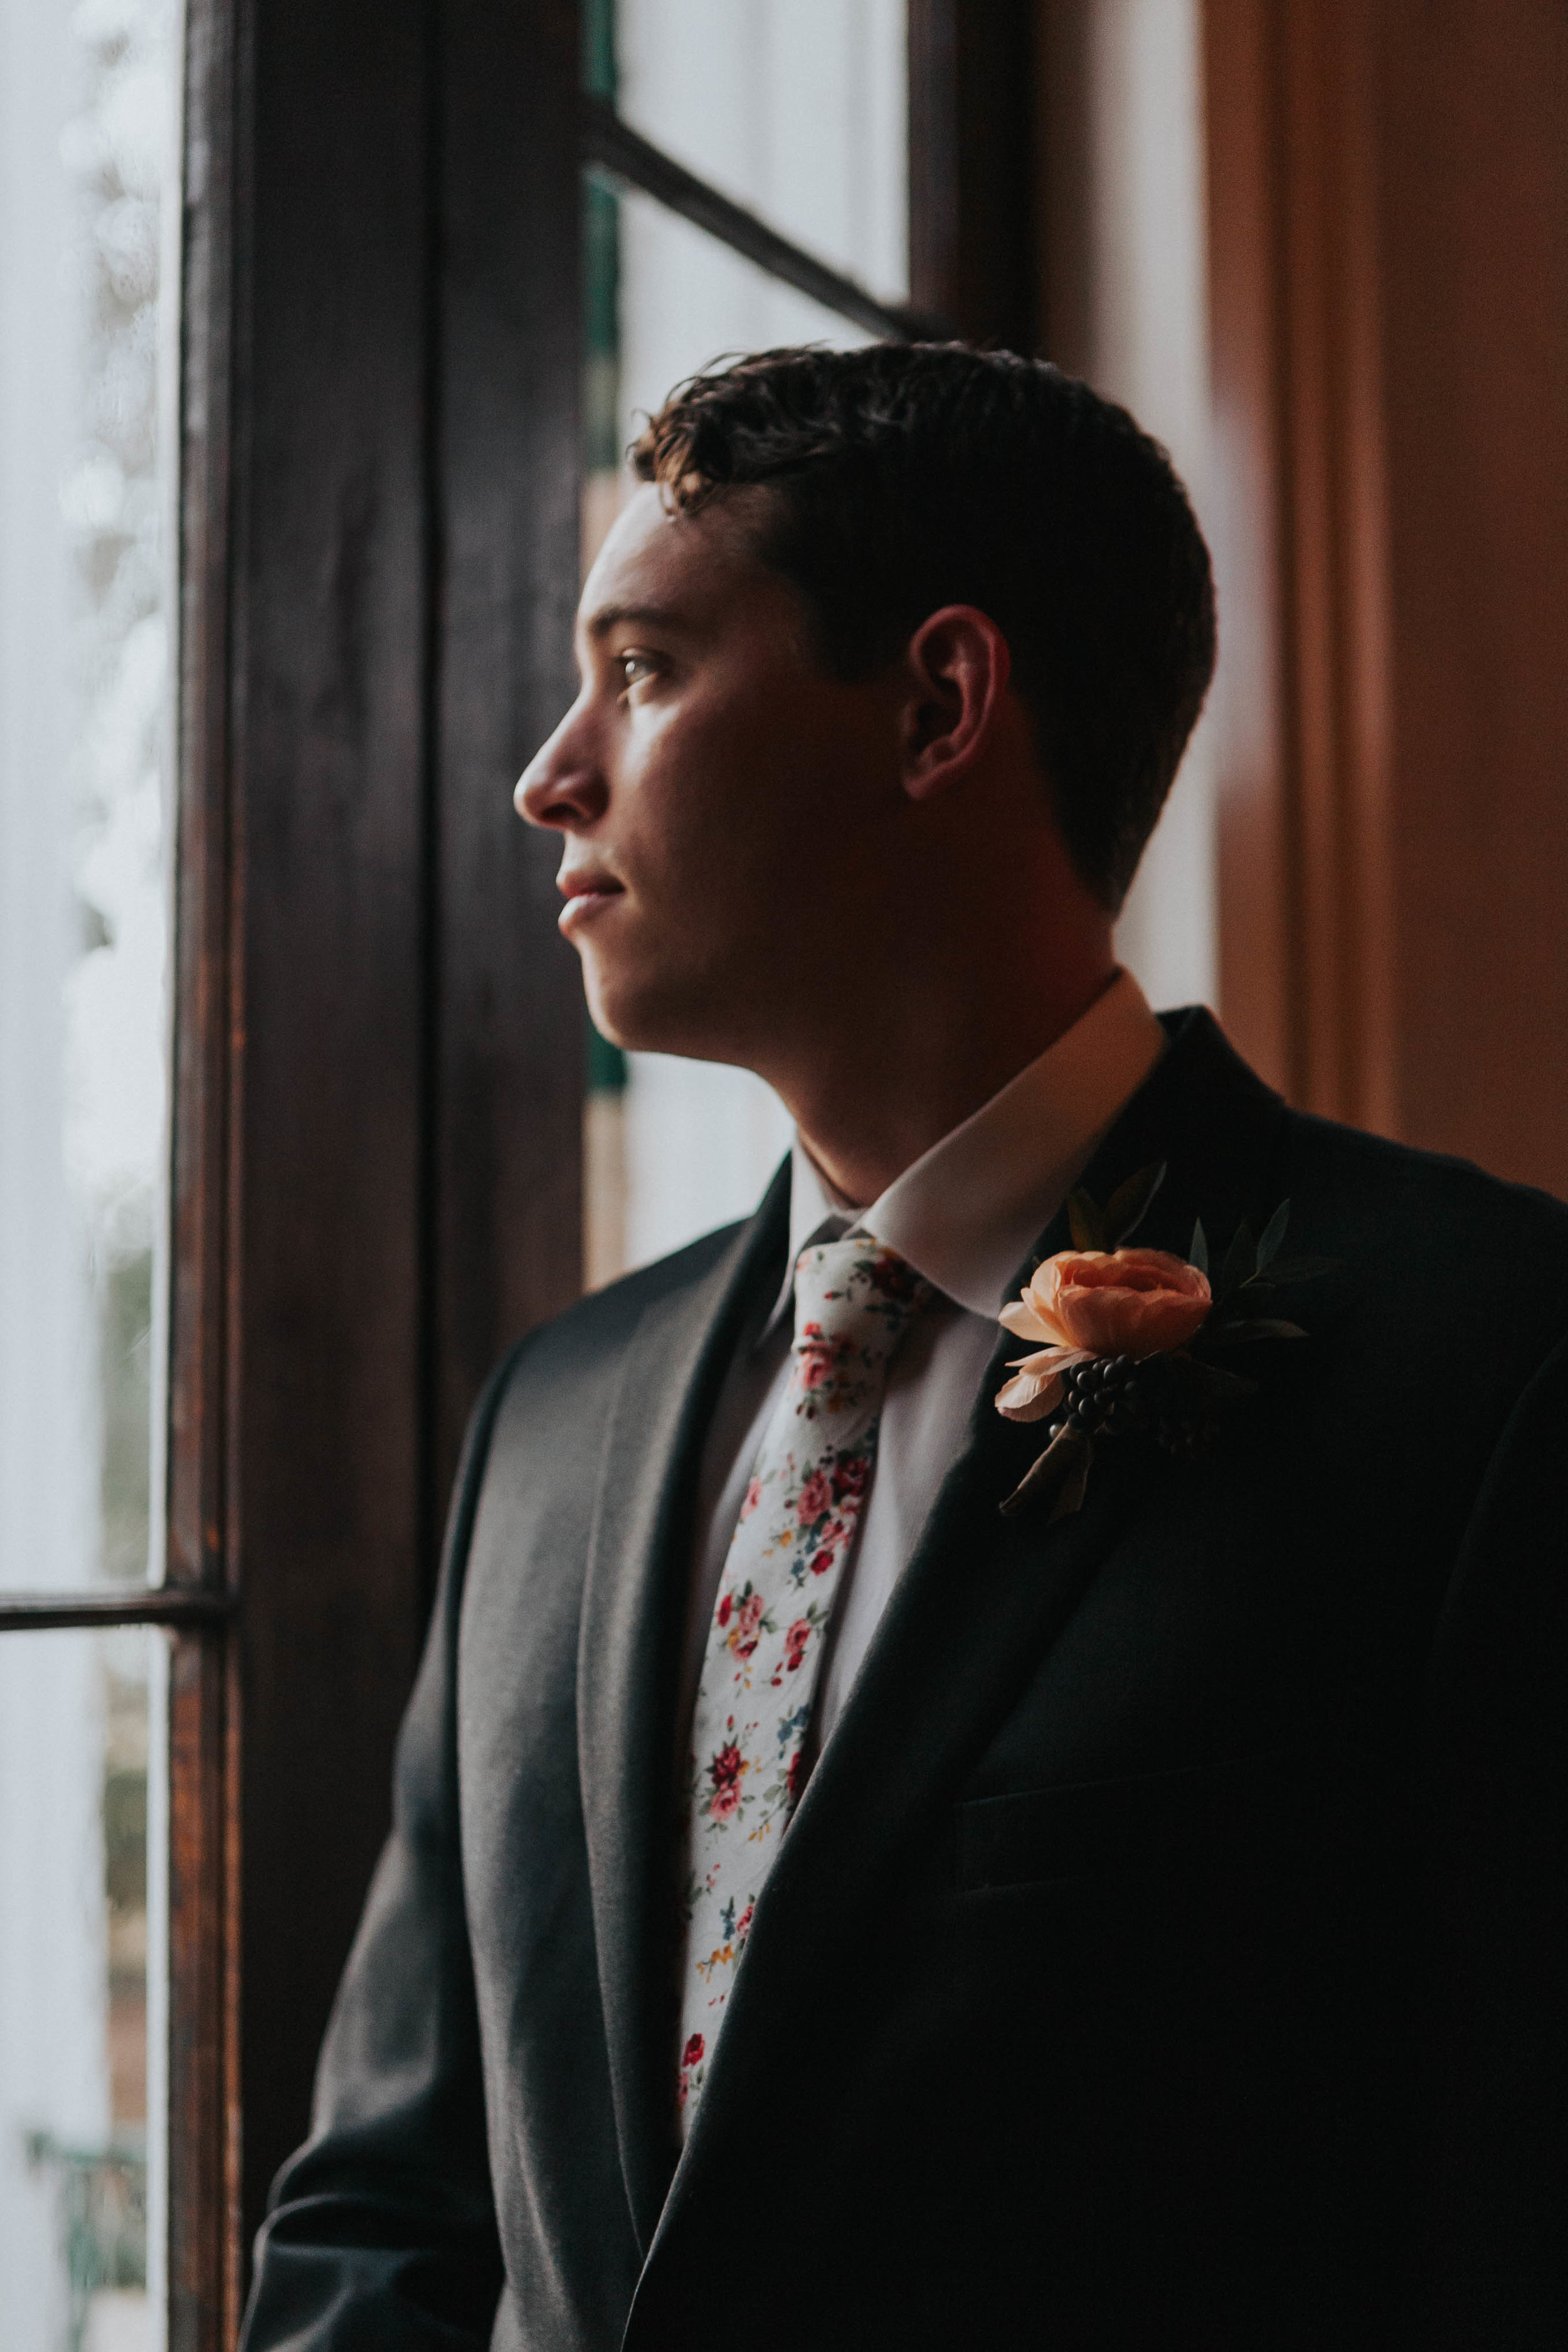 Charis_Lauren_Romantic_Wedding_Photographer_Nashville_0679.jpg